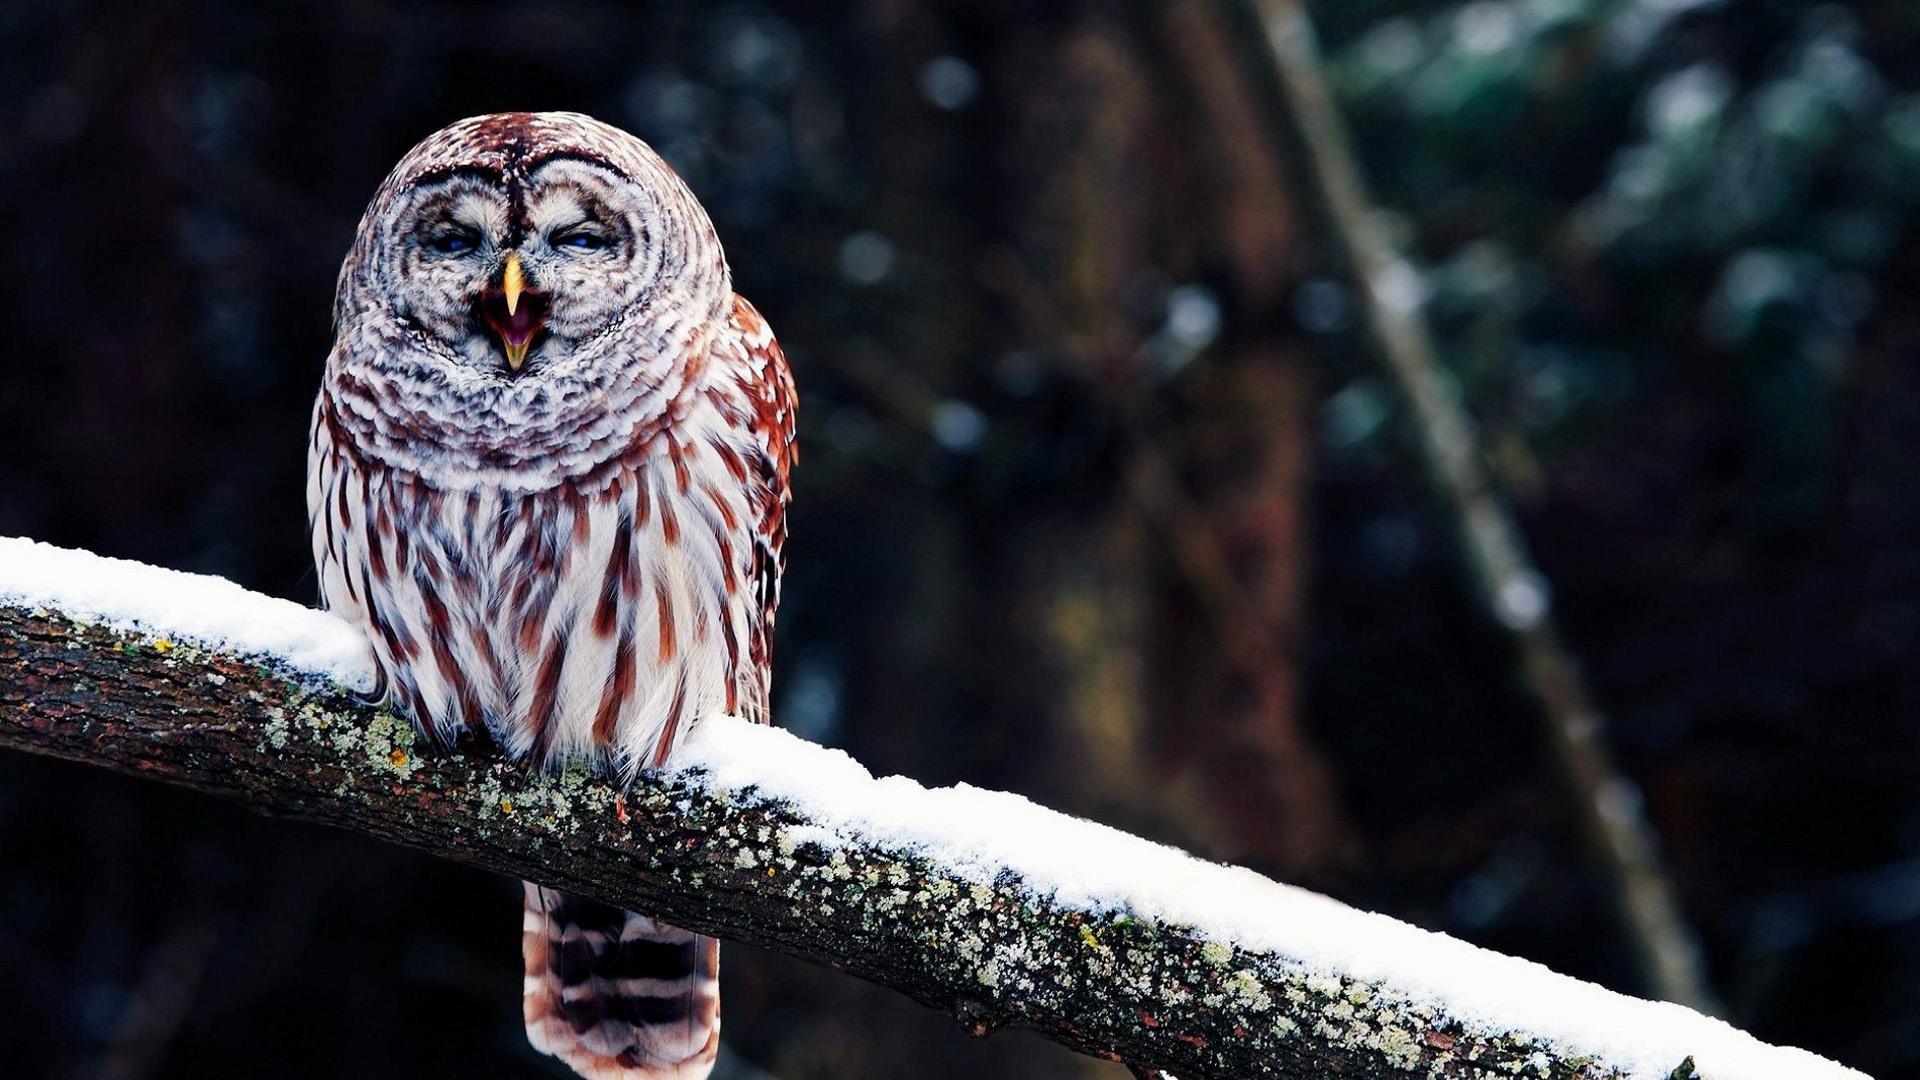 wallpaper.wiki-Free-Download-Cute-Owl-Wallpaper-PIC-